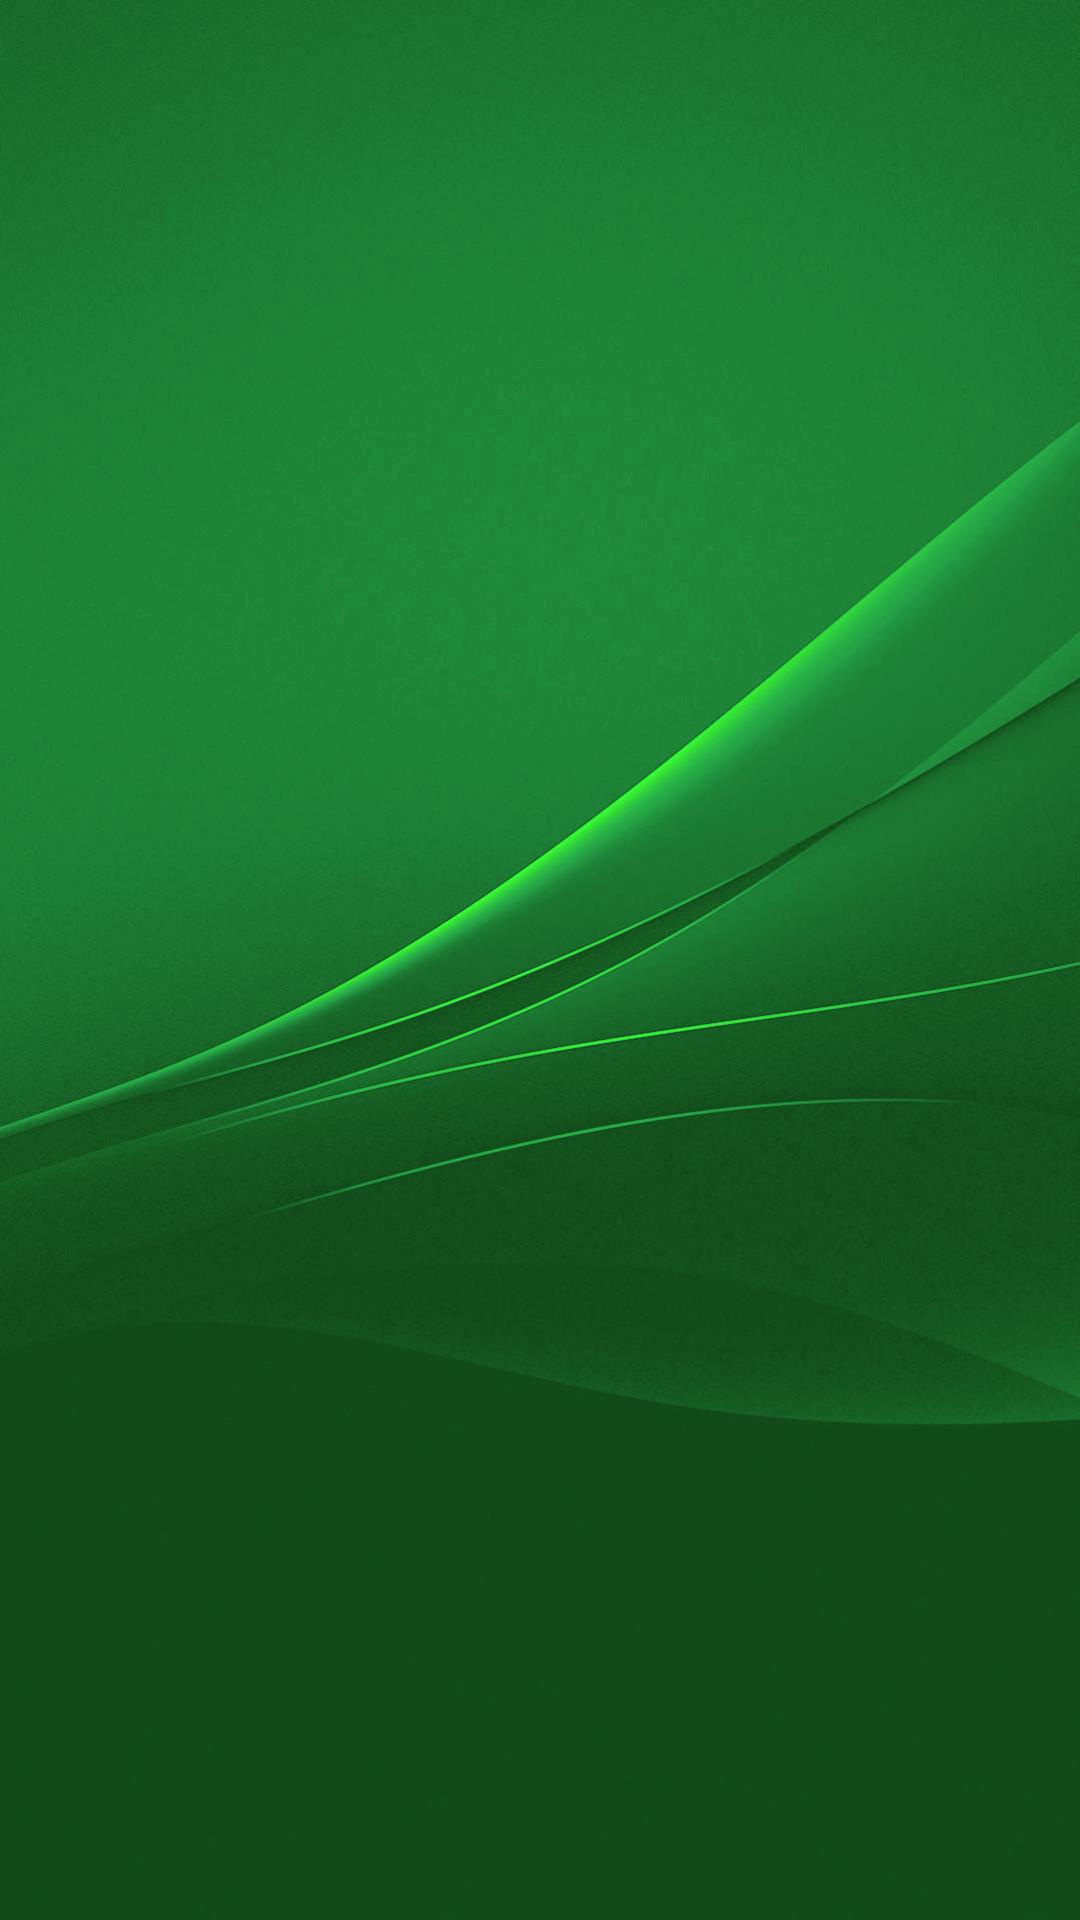 Green Xperia Lollipop Experience Flow Wallpaper — Gizmo ...